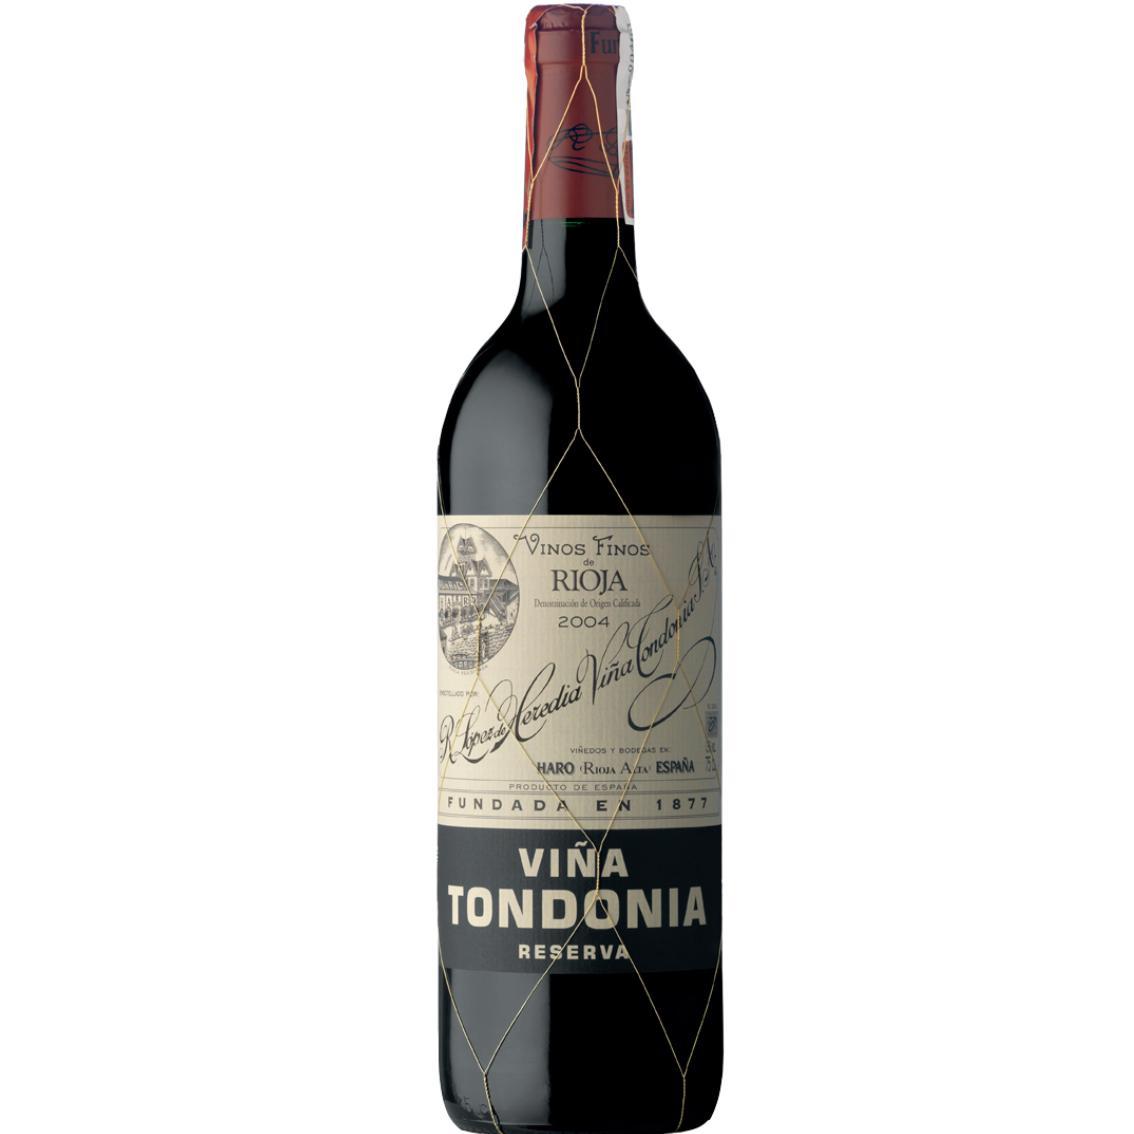 2009 Vina Tondonia Reserva Rioja - Lopez de Heredia